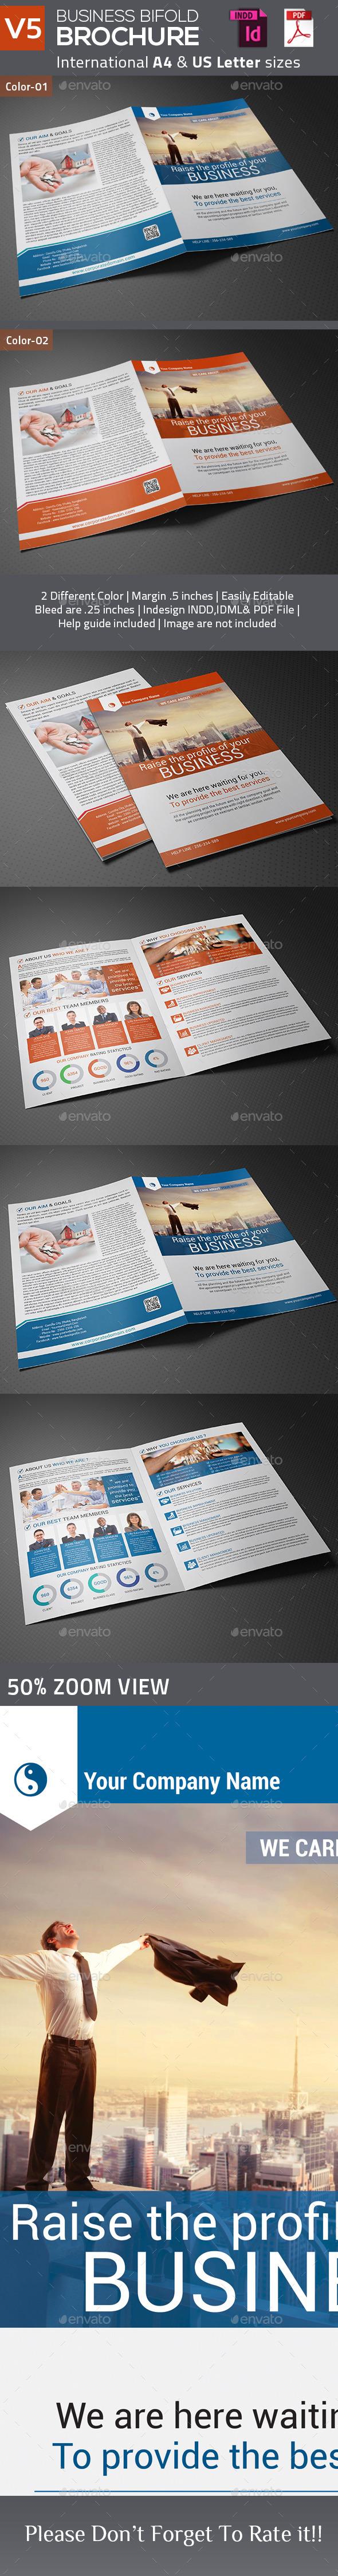 Business Bifold Brochure V5 - Corporate Brochures